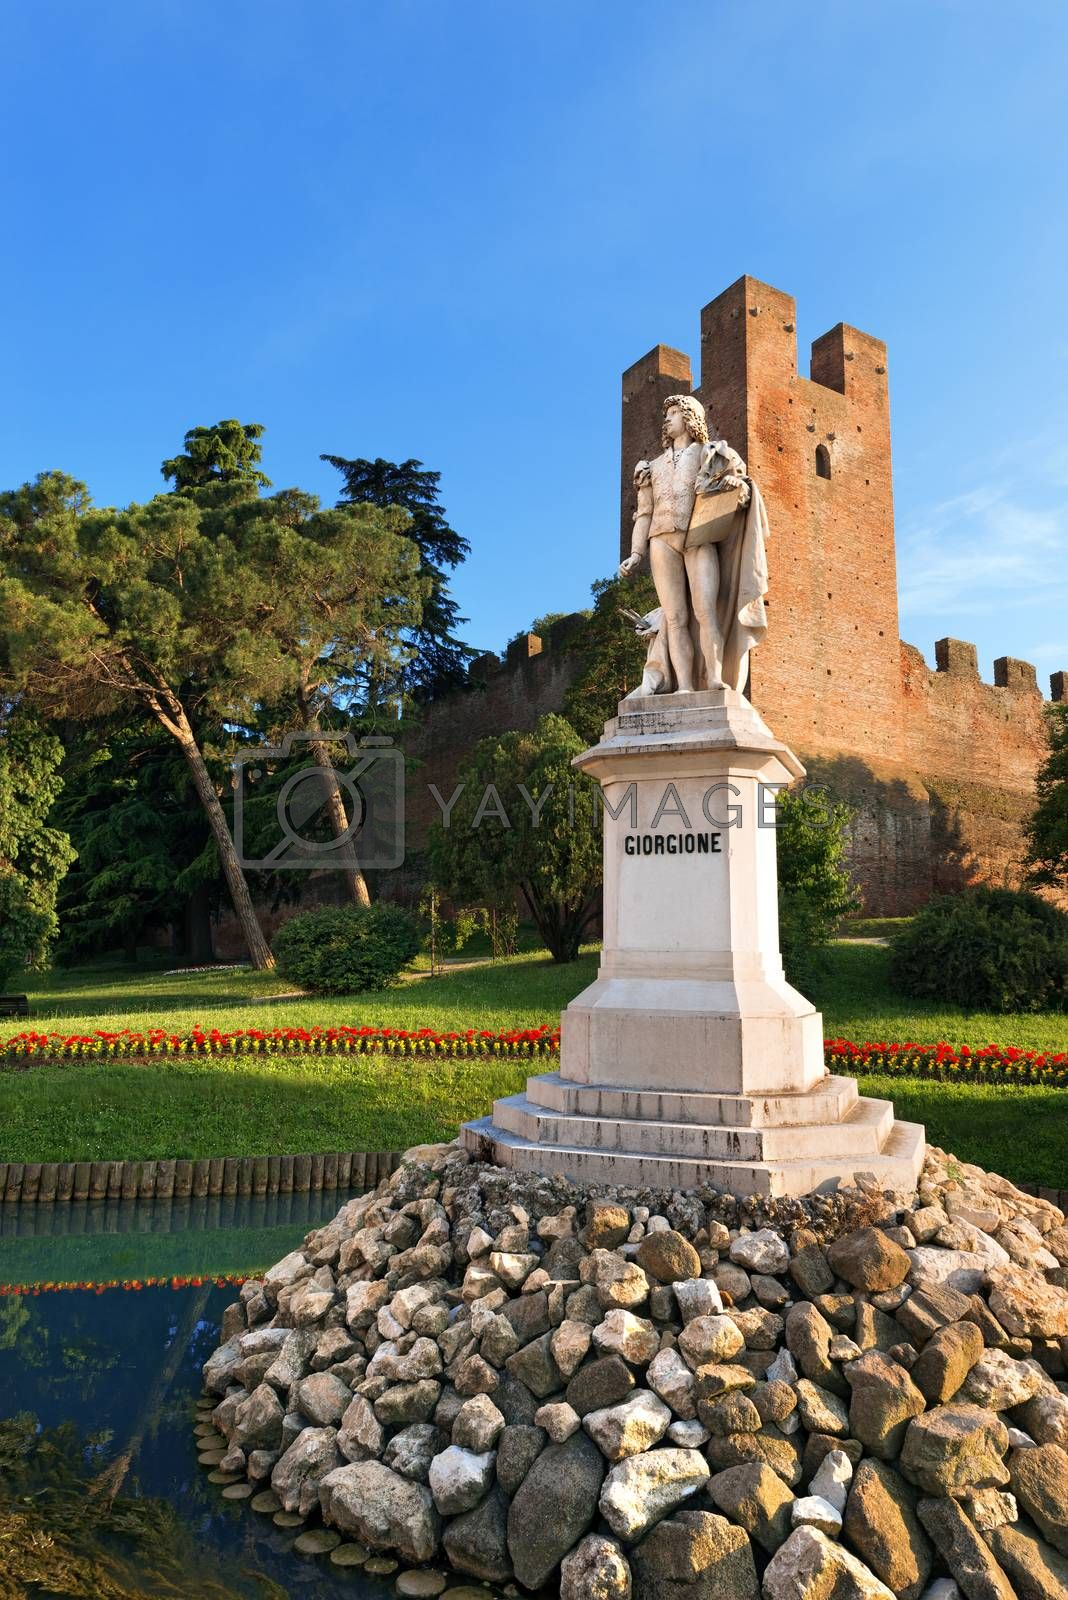 Monument of Giorgione Castelfranco Veneto - Italy by catalby